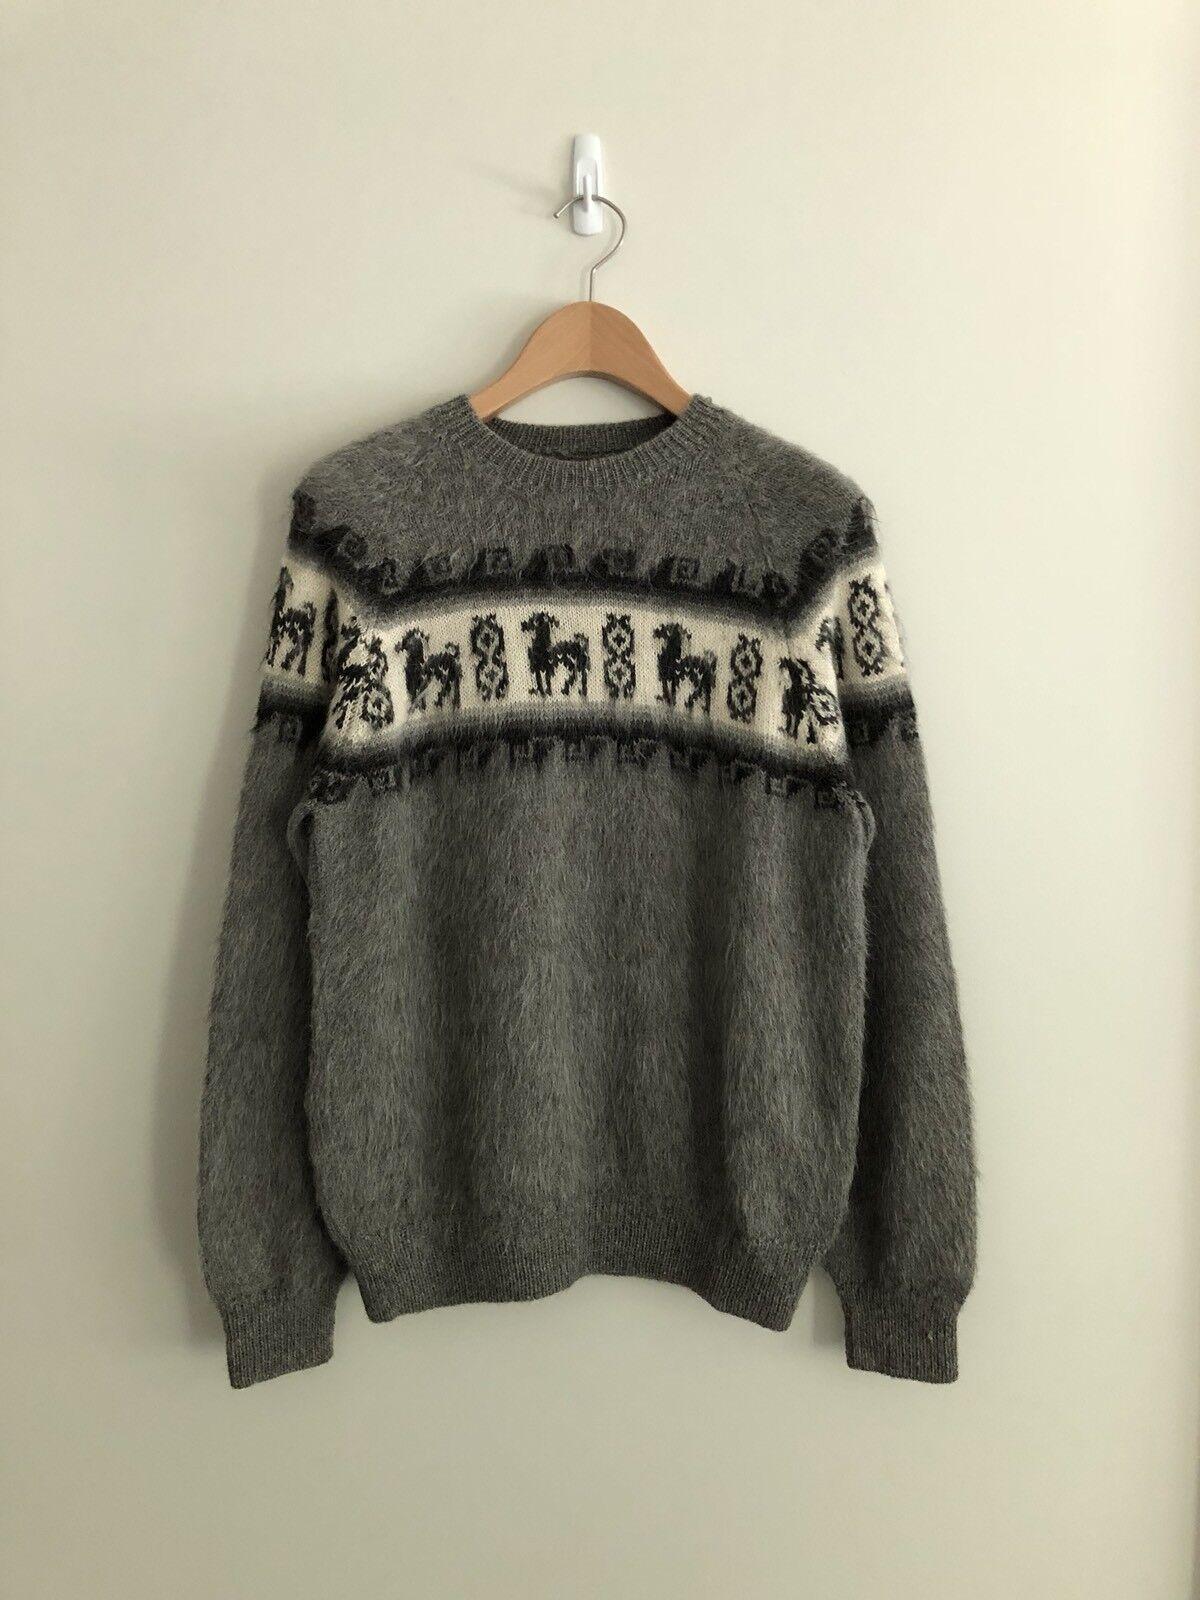 Vintage Men's Alpaca Mohair Sweater Größe M